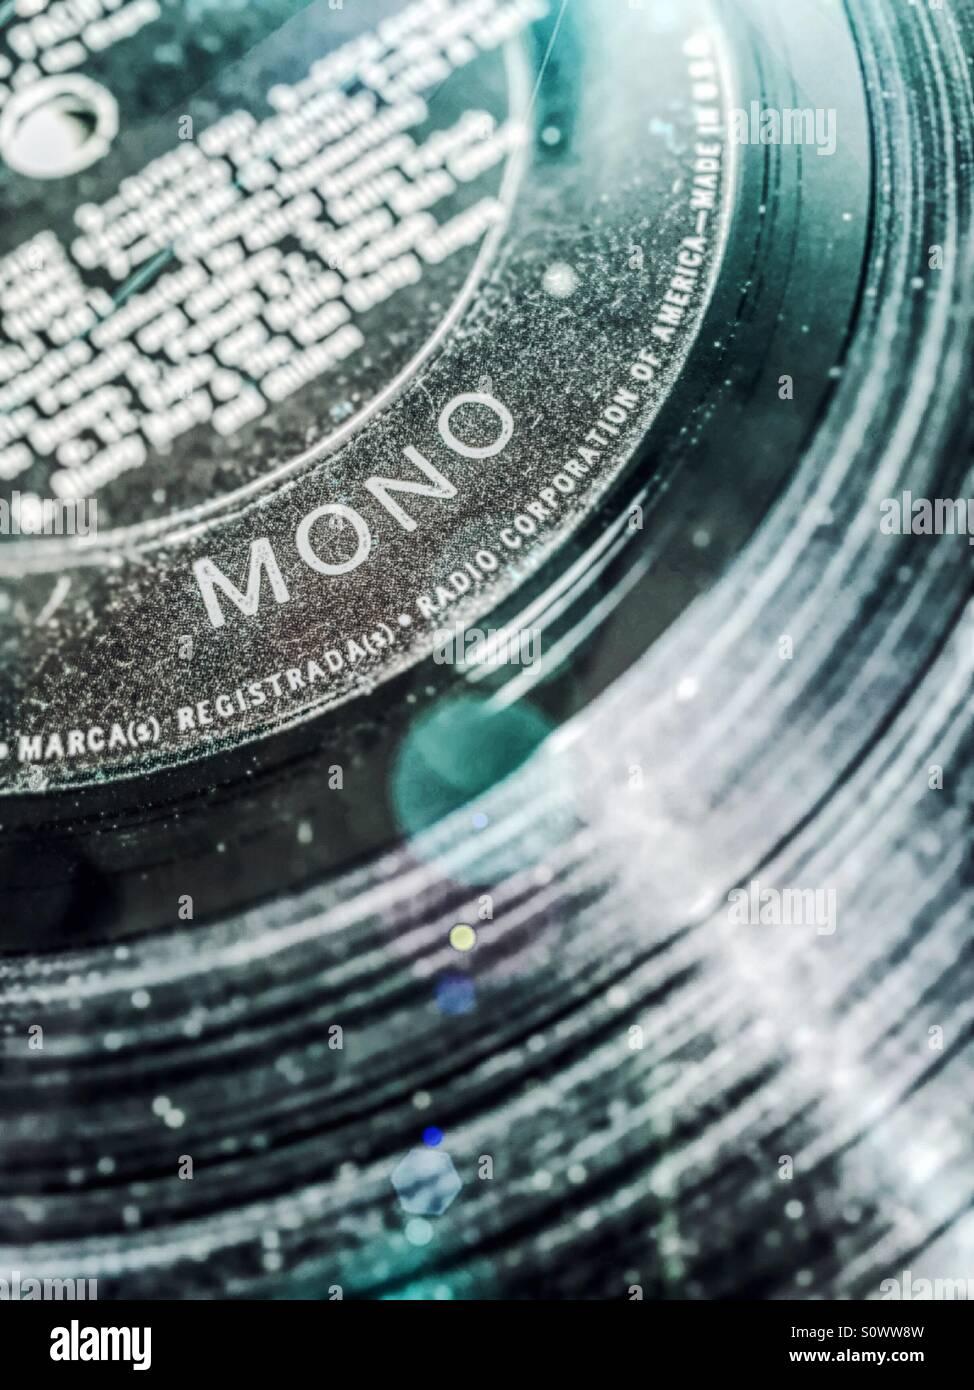 Vintage vinyl longplaying record recorded in mono - Stock Image